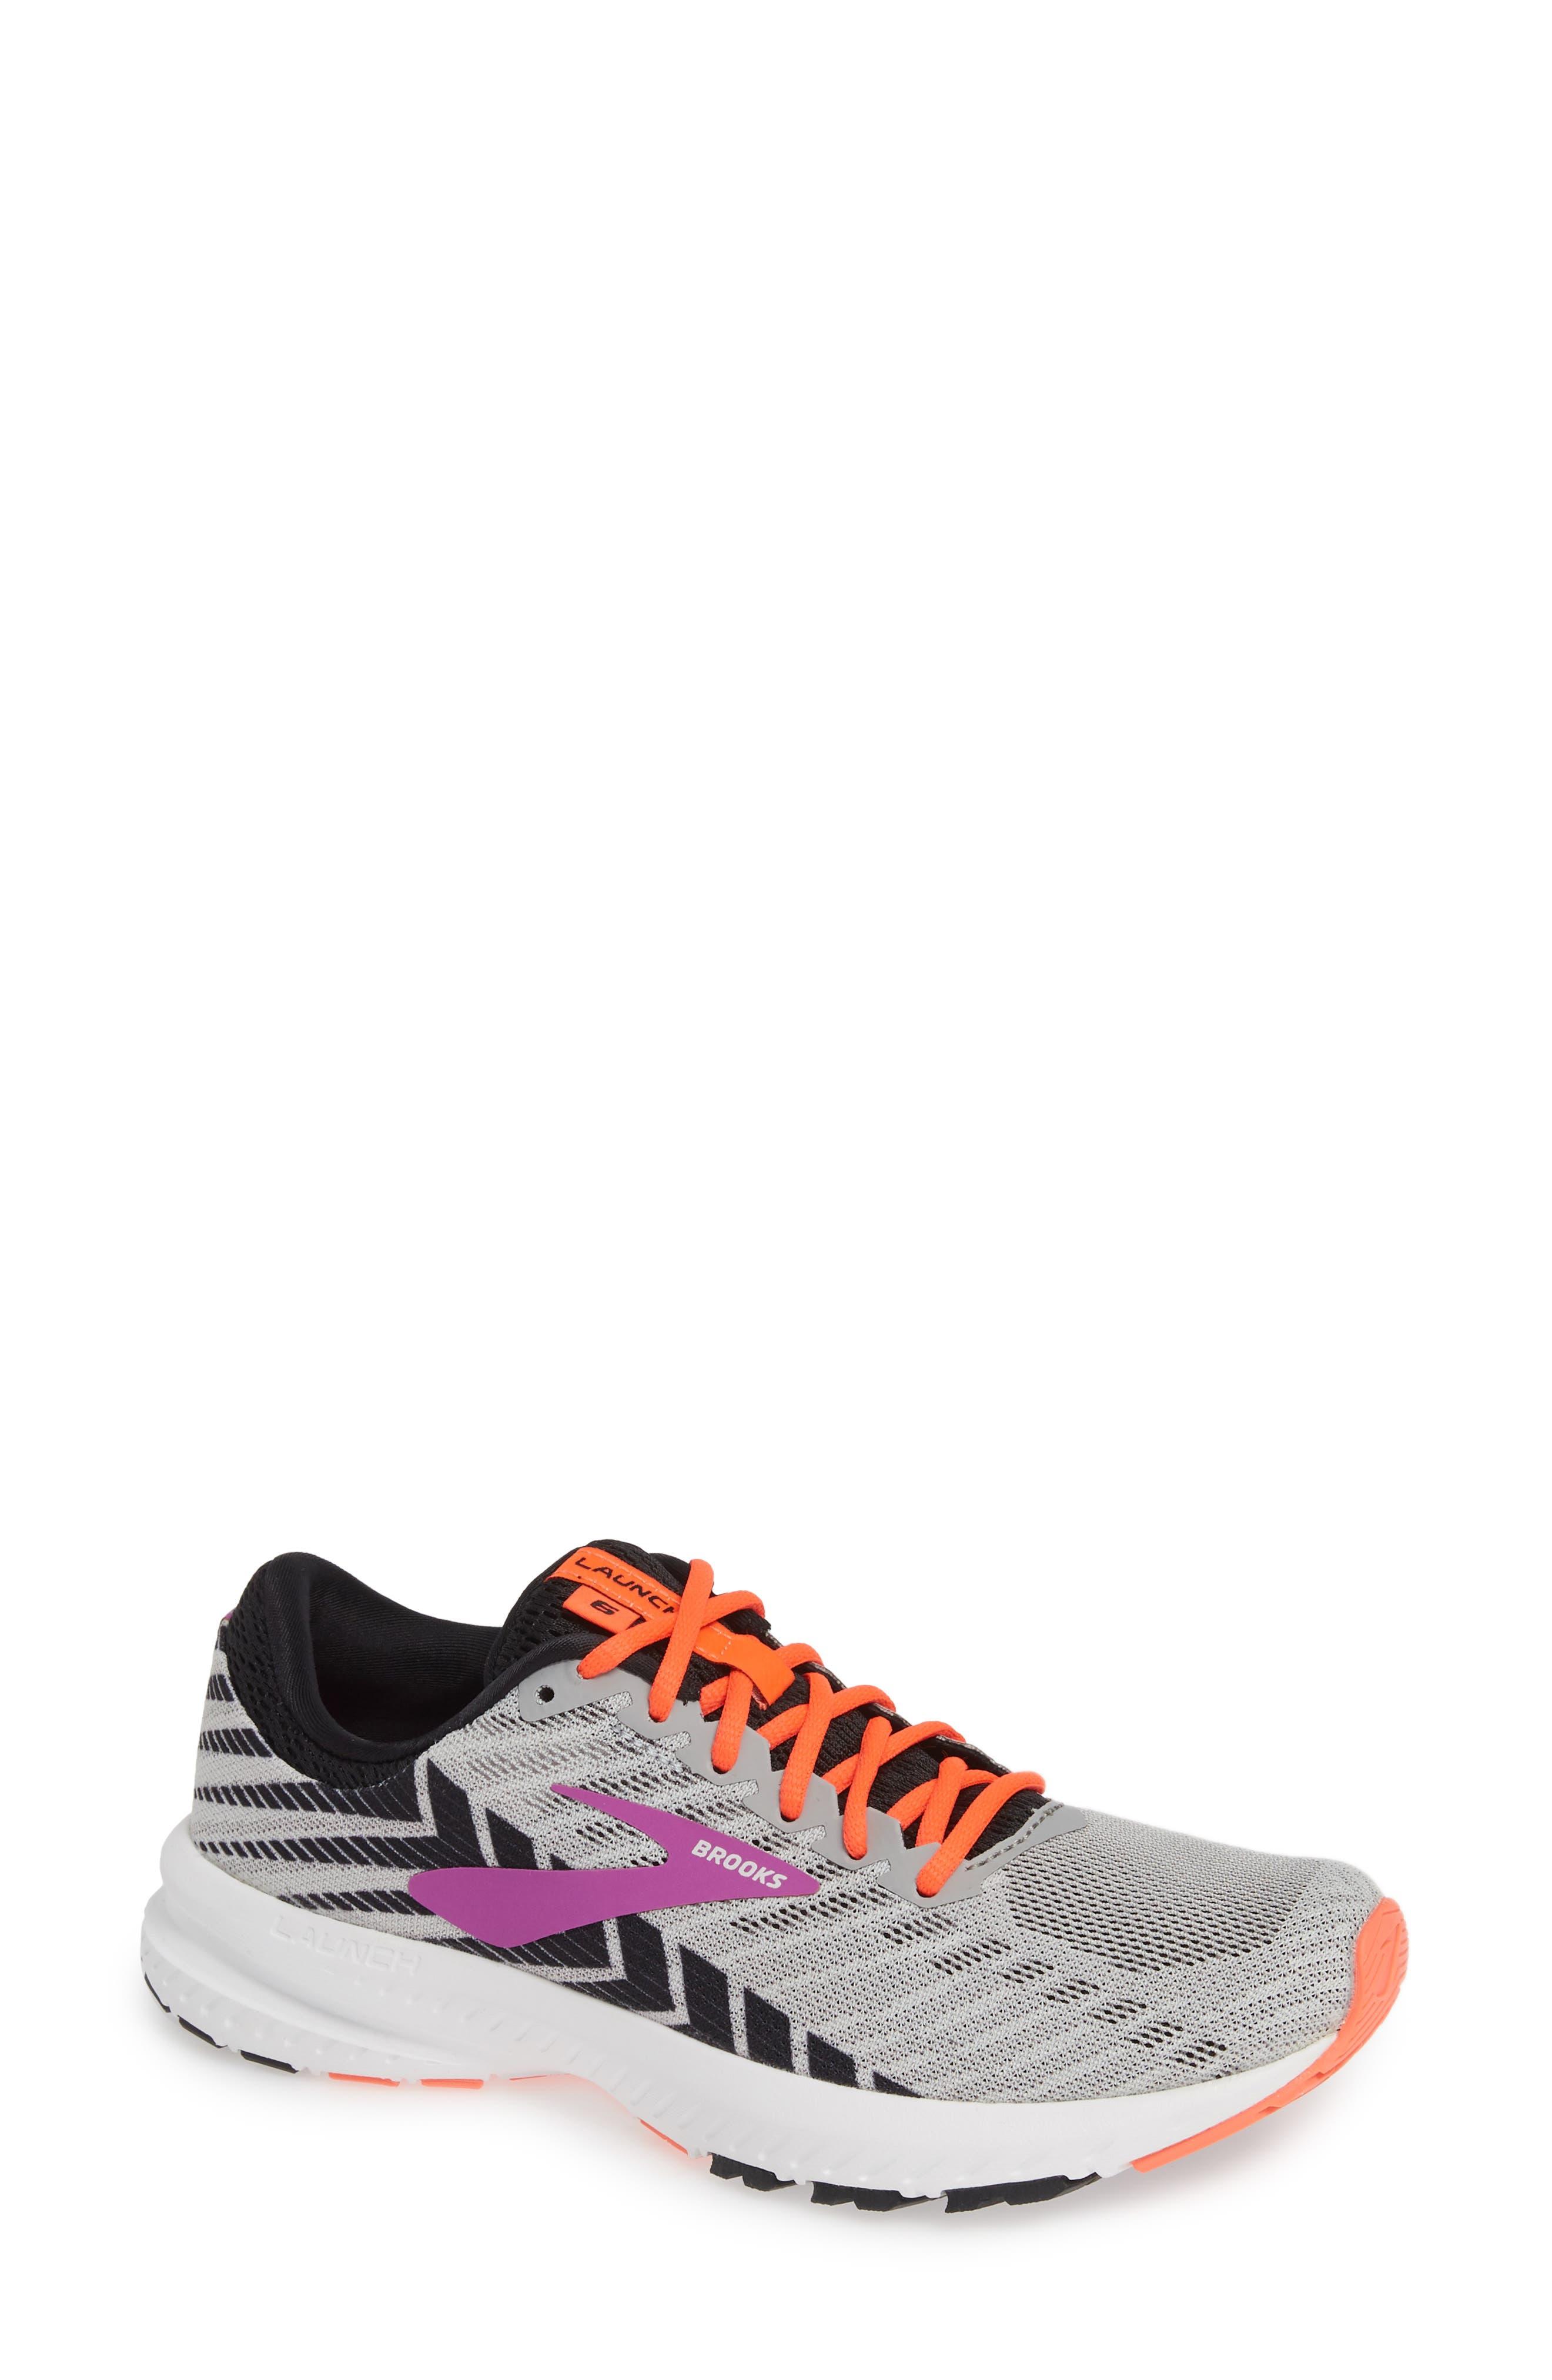 Brooks Launch 6 Running Shoe B - Grey